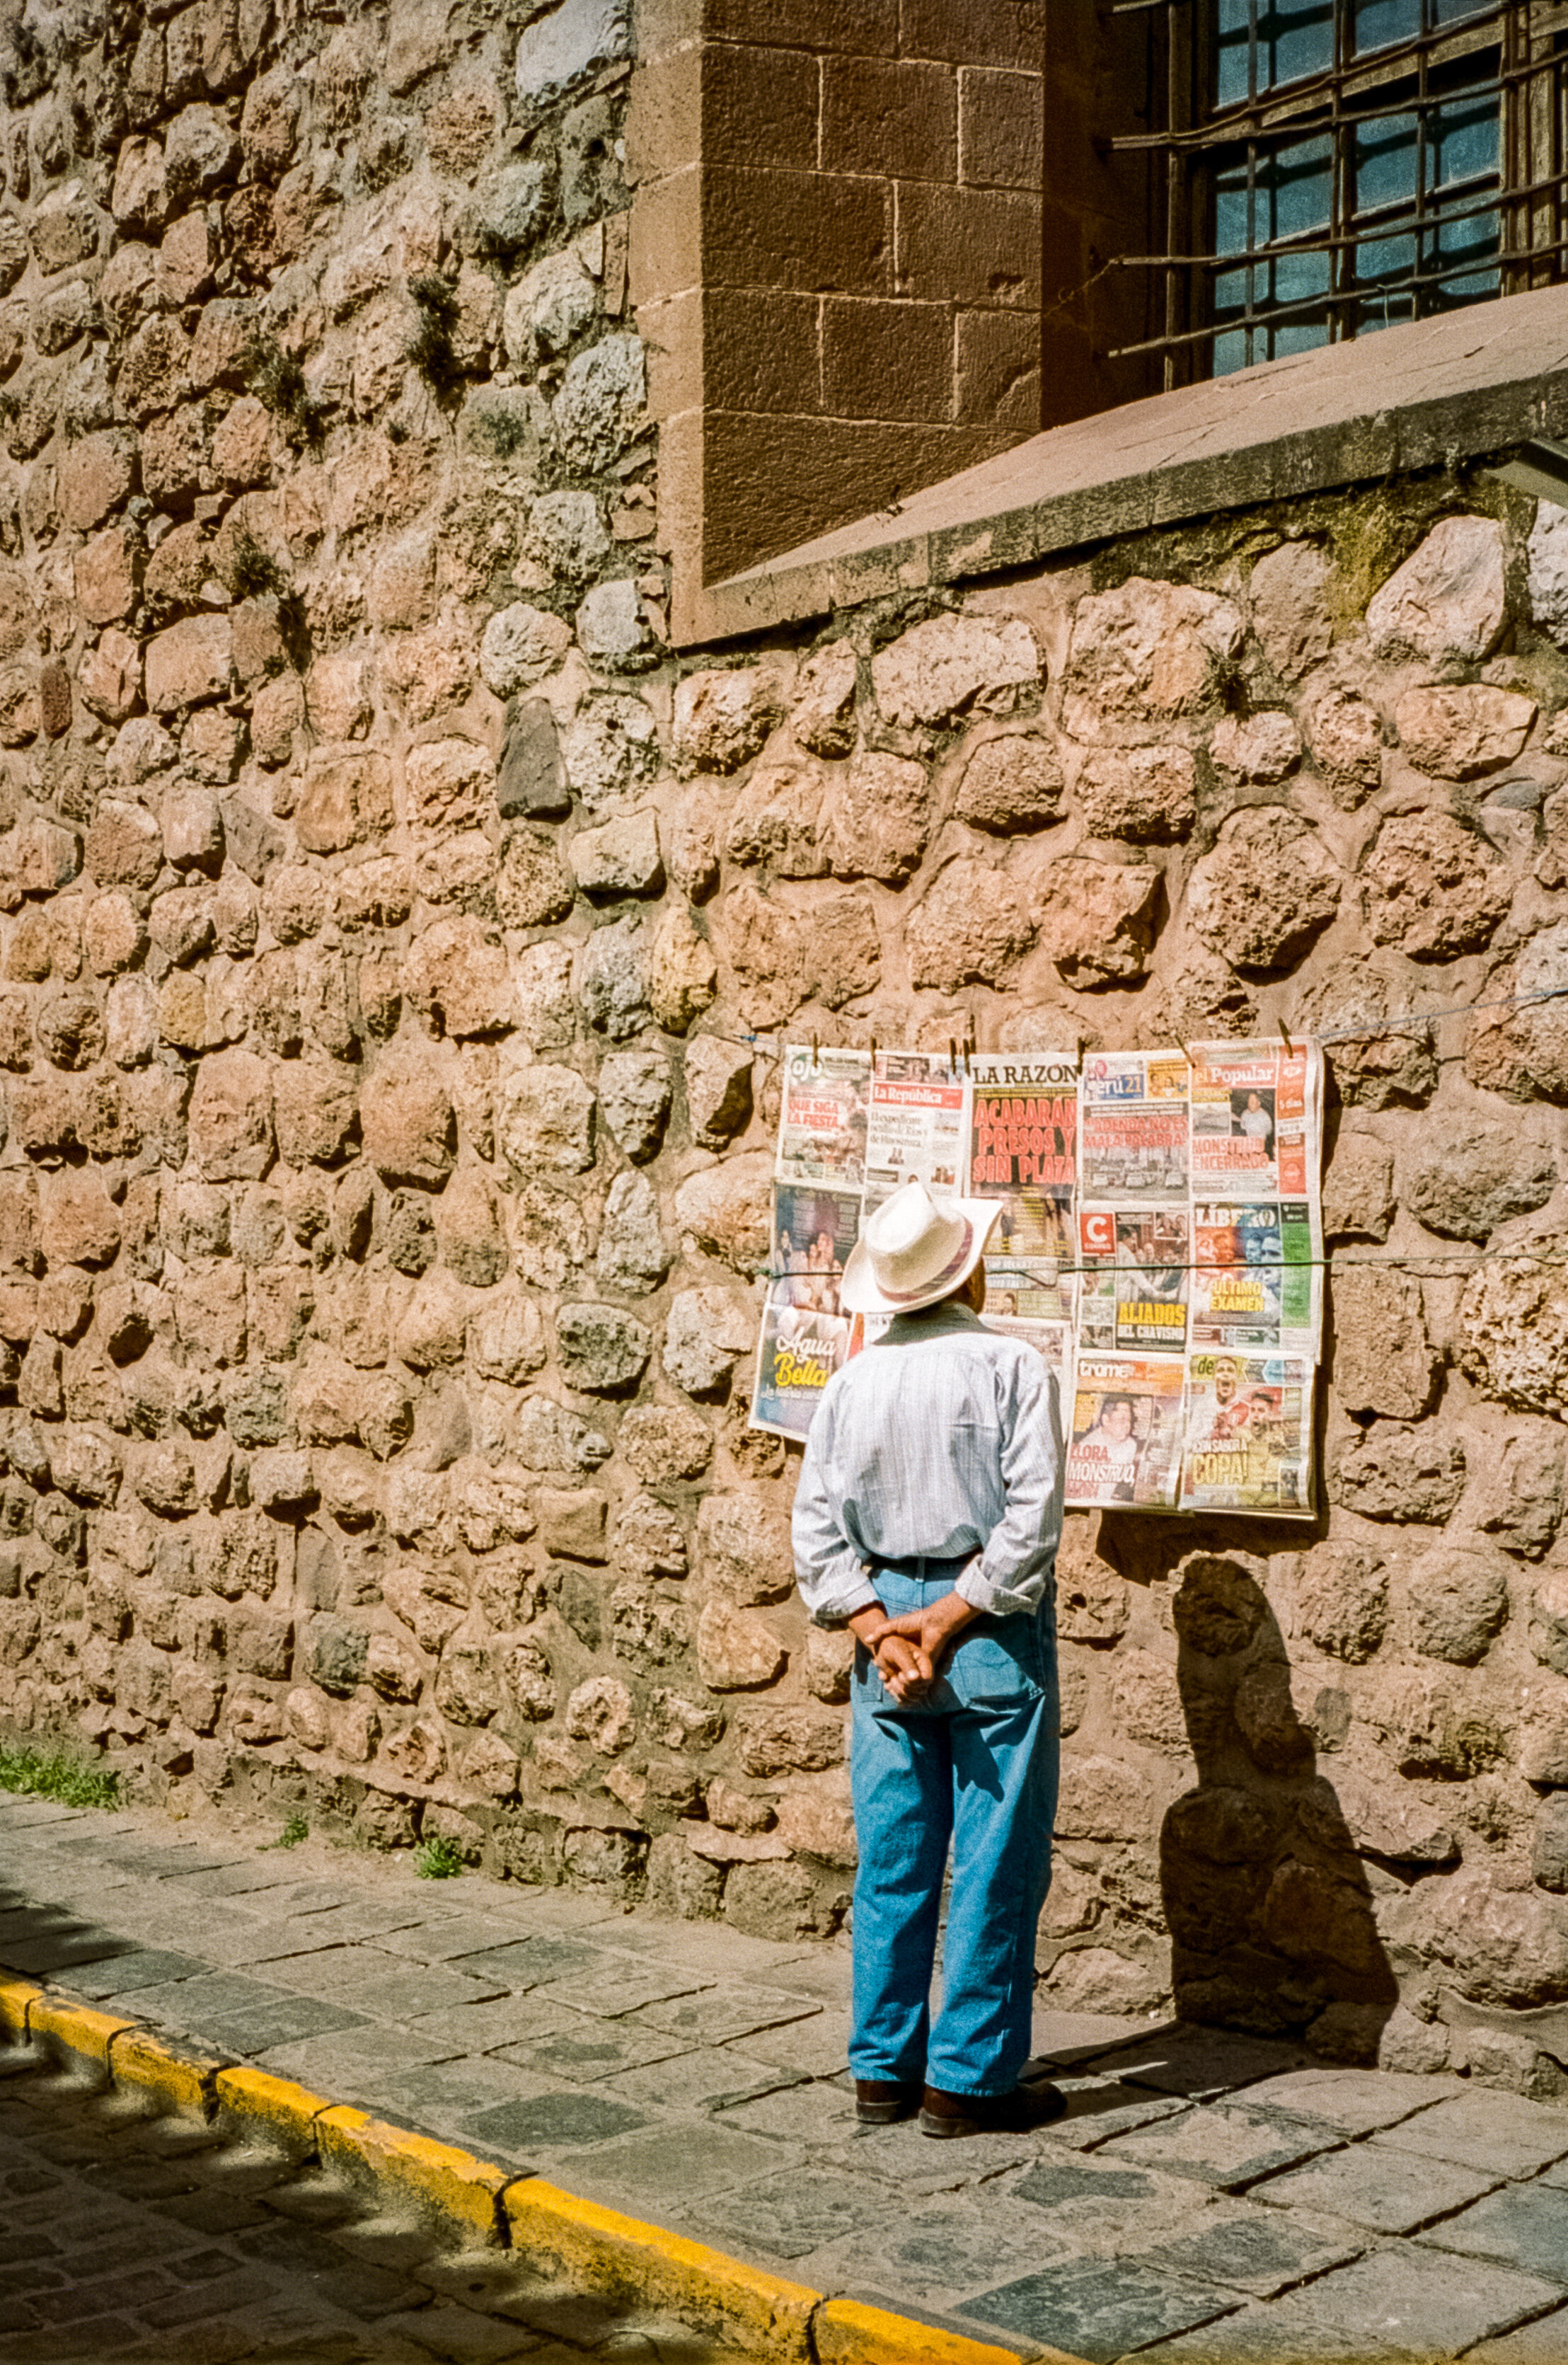 Man on Texture, 2019, Photograph, 4.2MB, $TBC